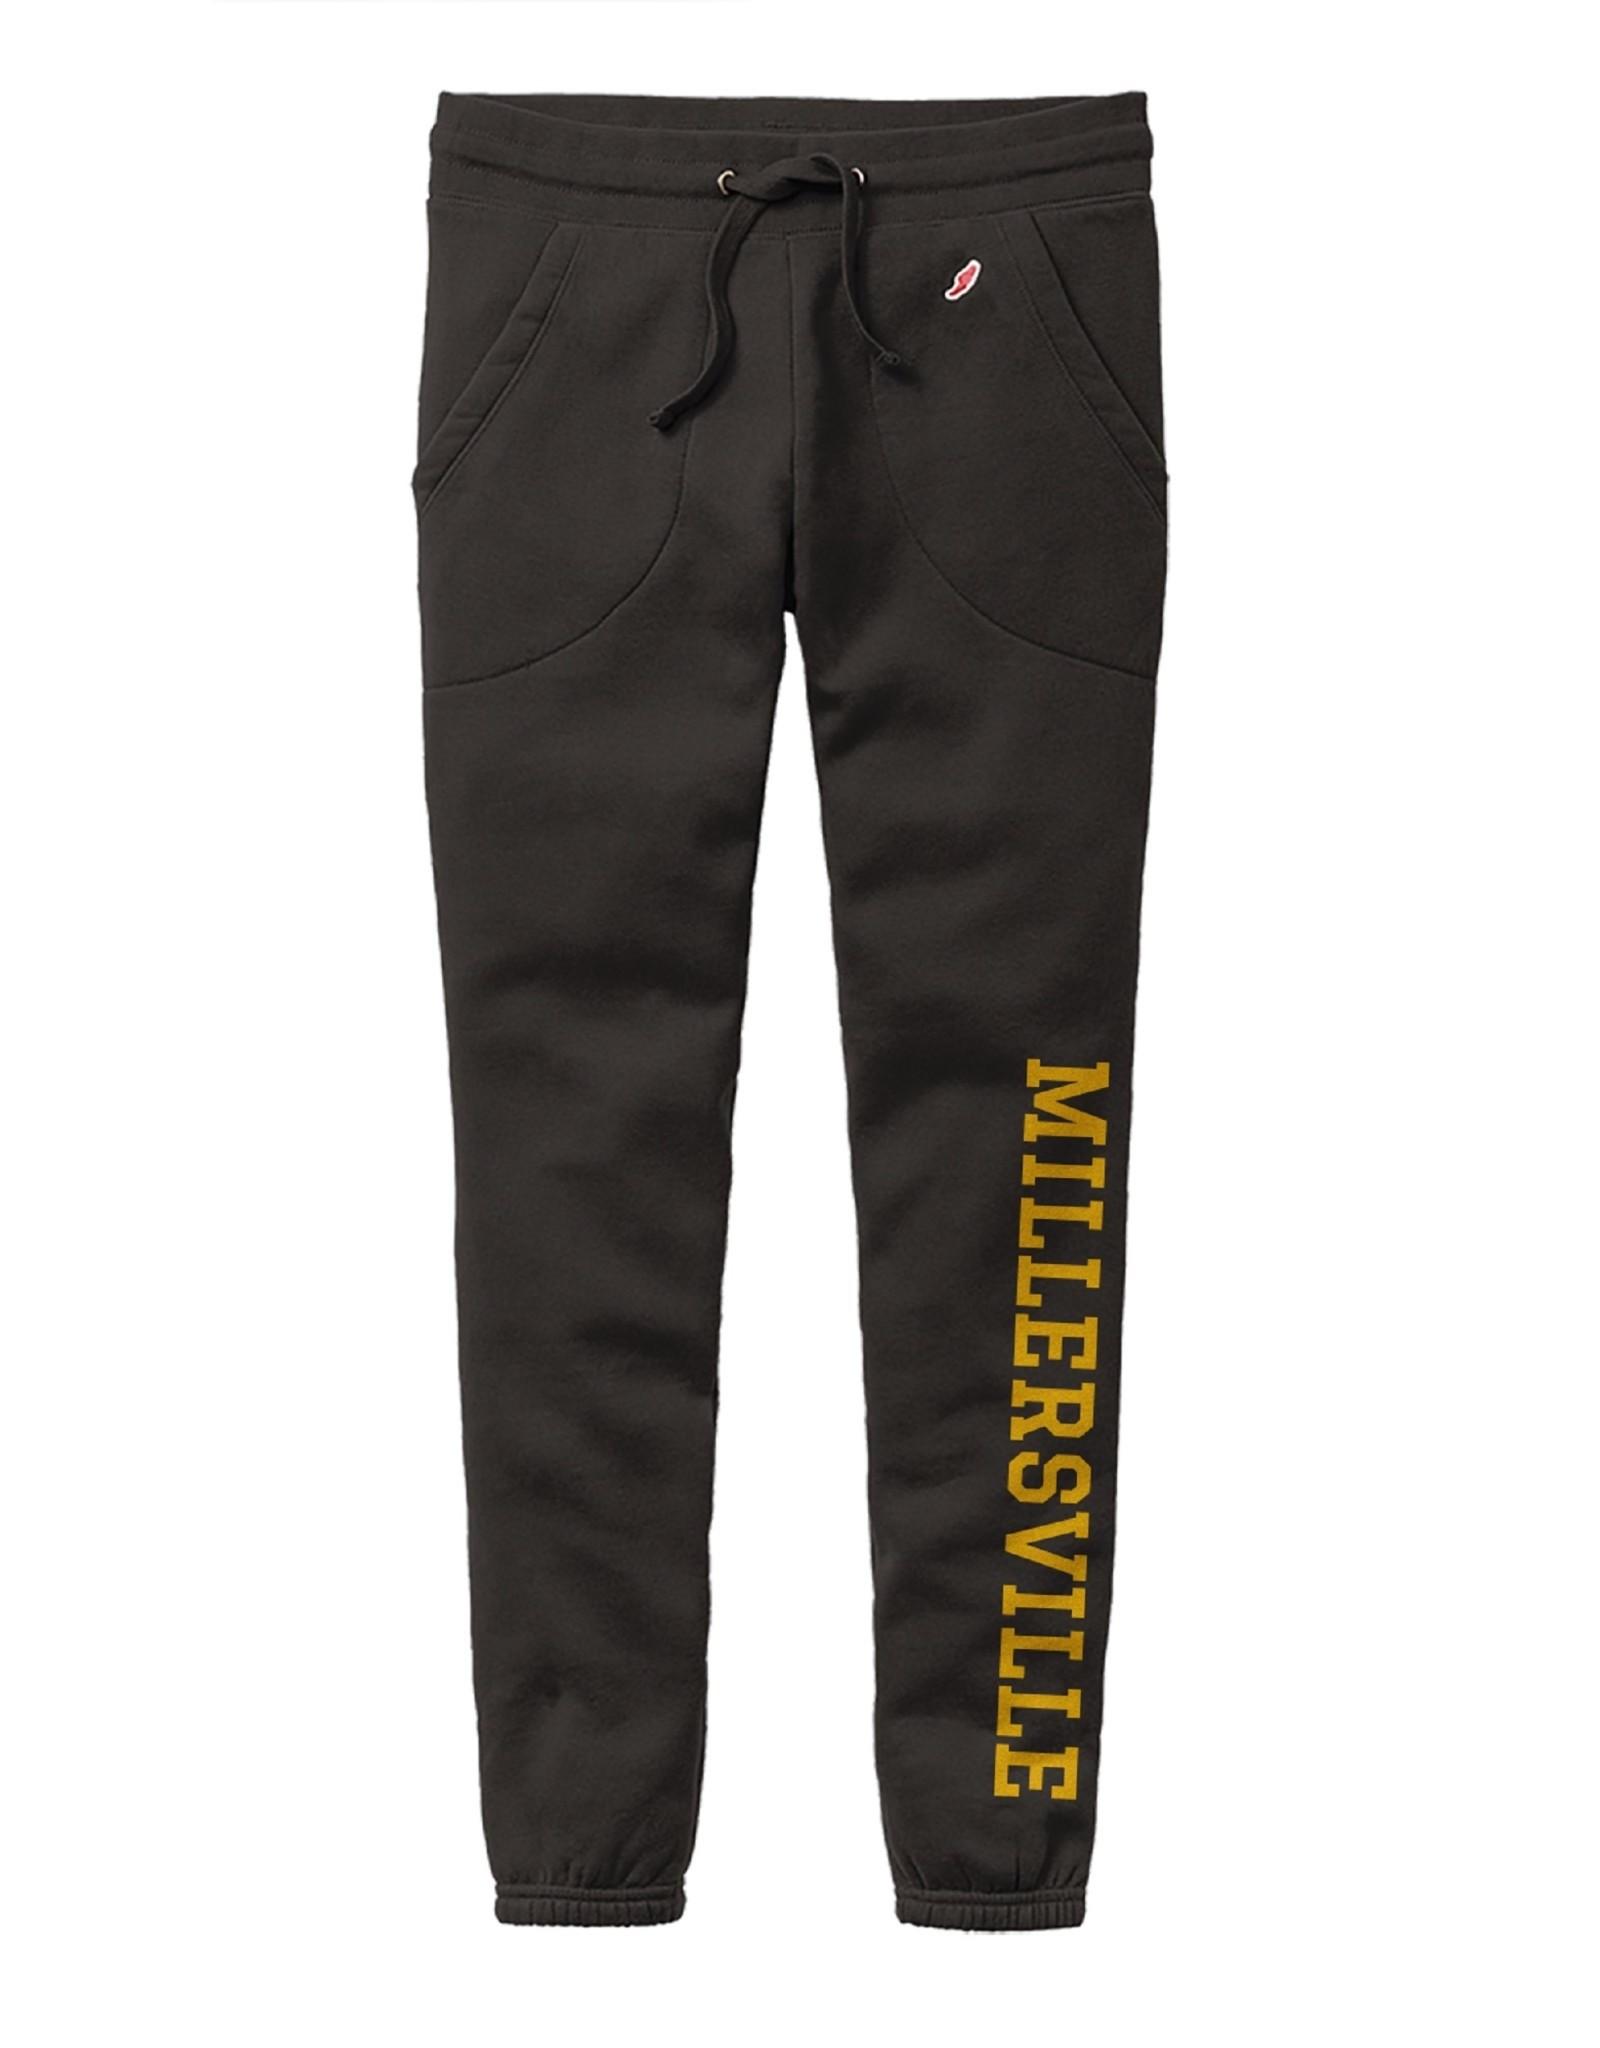 League Academy Sweatpants - Sale!